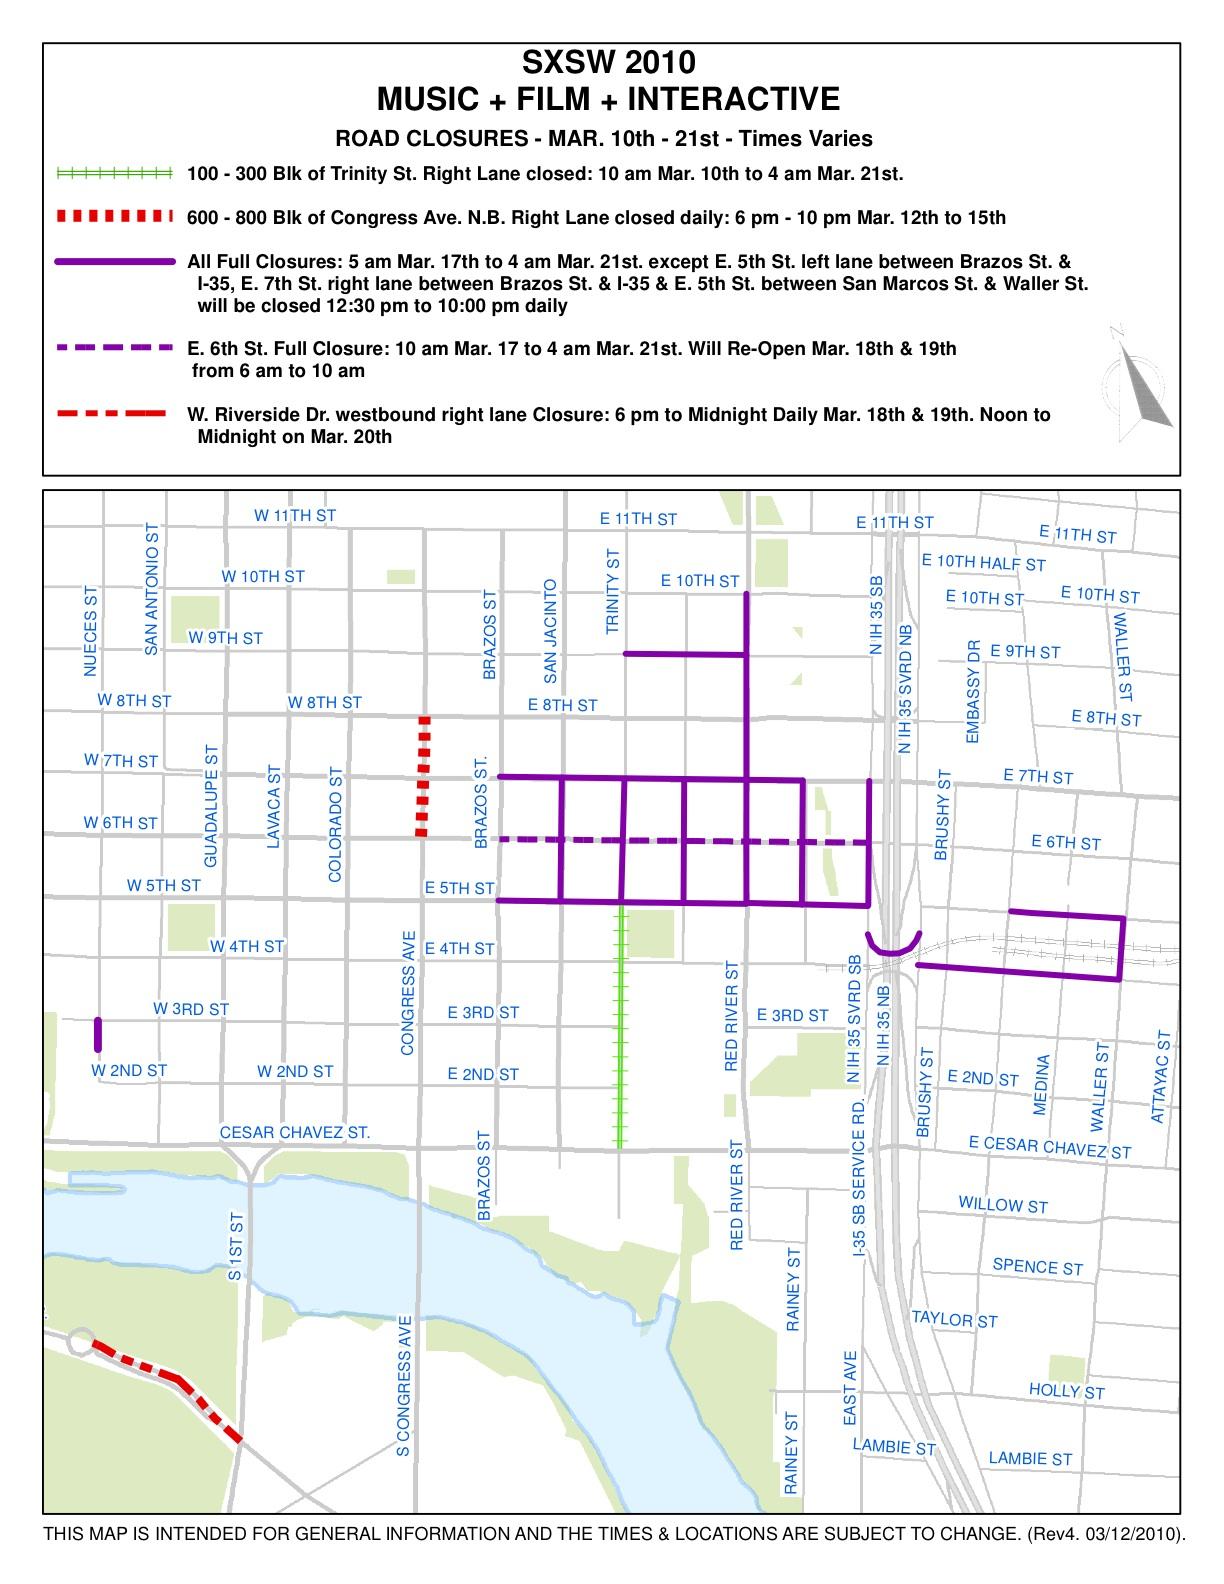 SXSW 2011 – Downtown Austin Street Closures